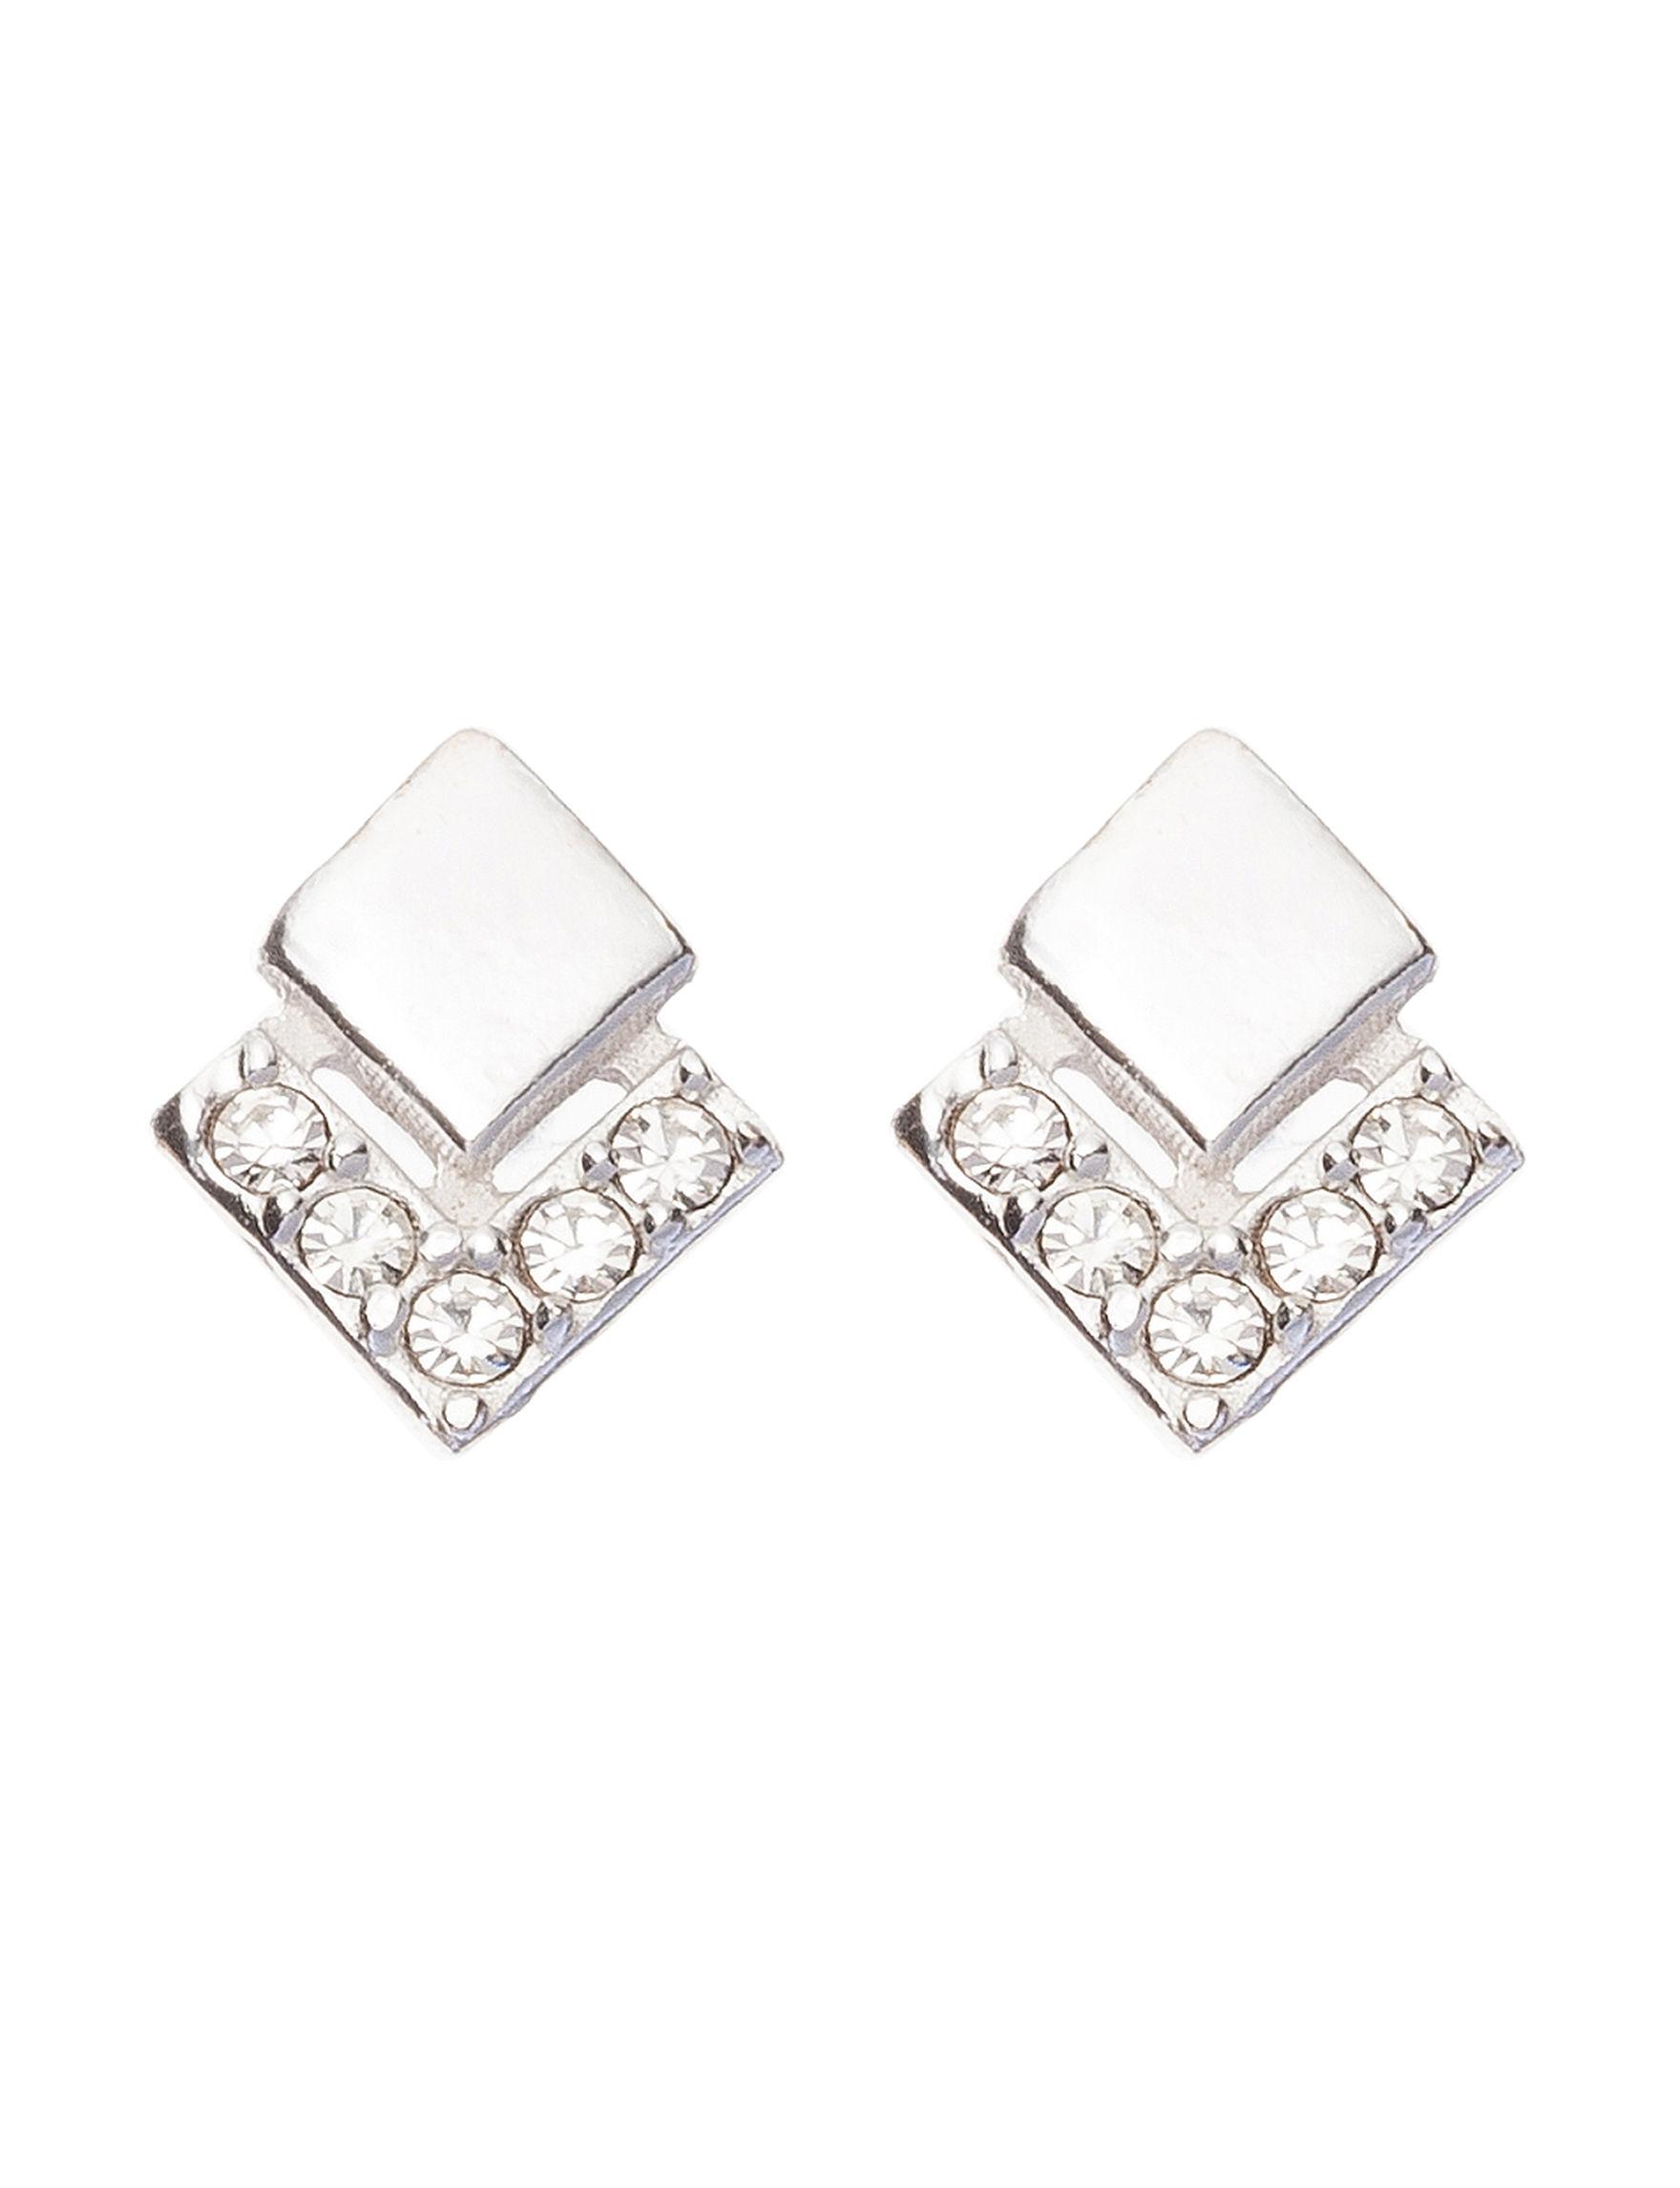 Marsala Miscellaneous Studs Fine Jewelry